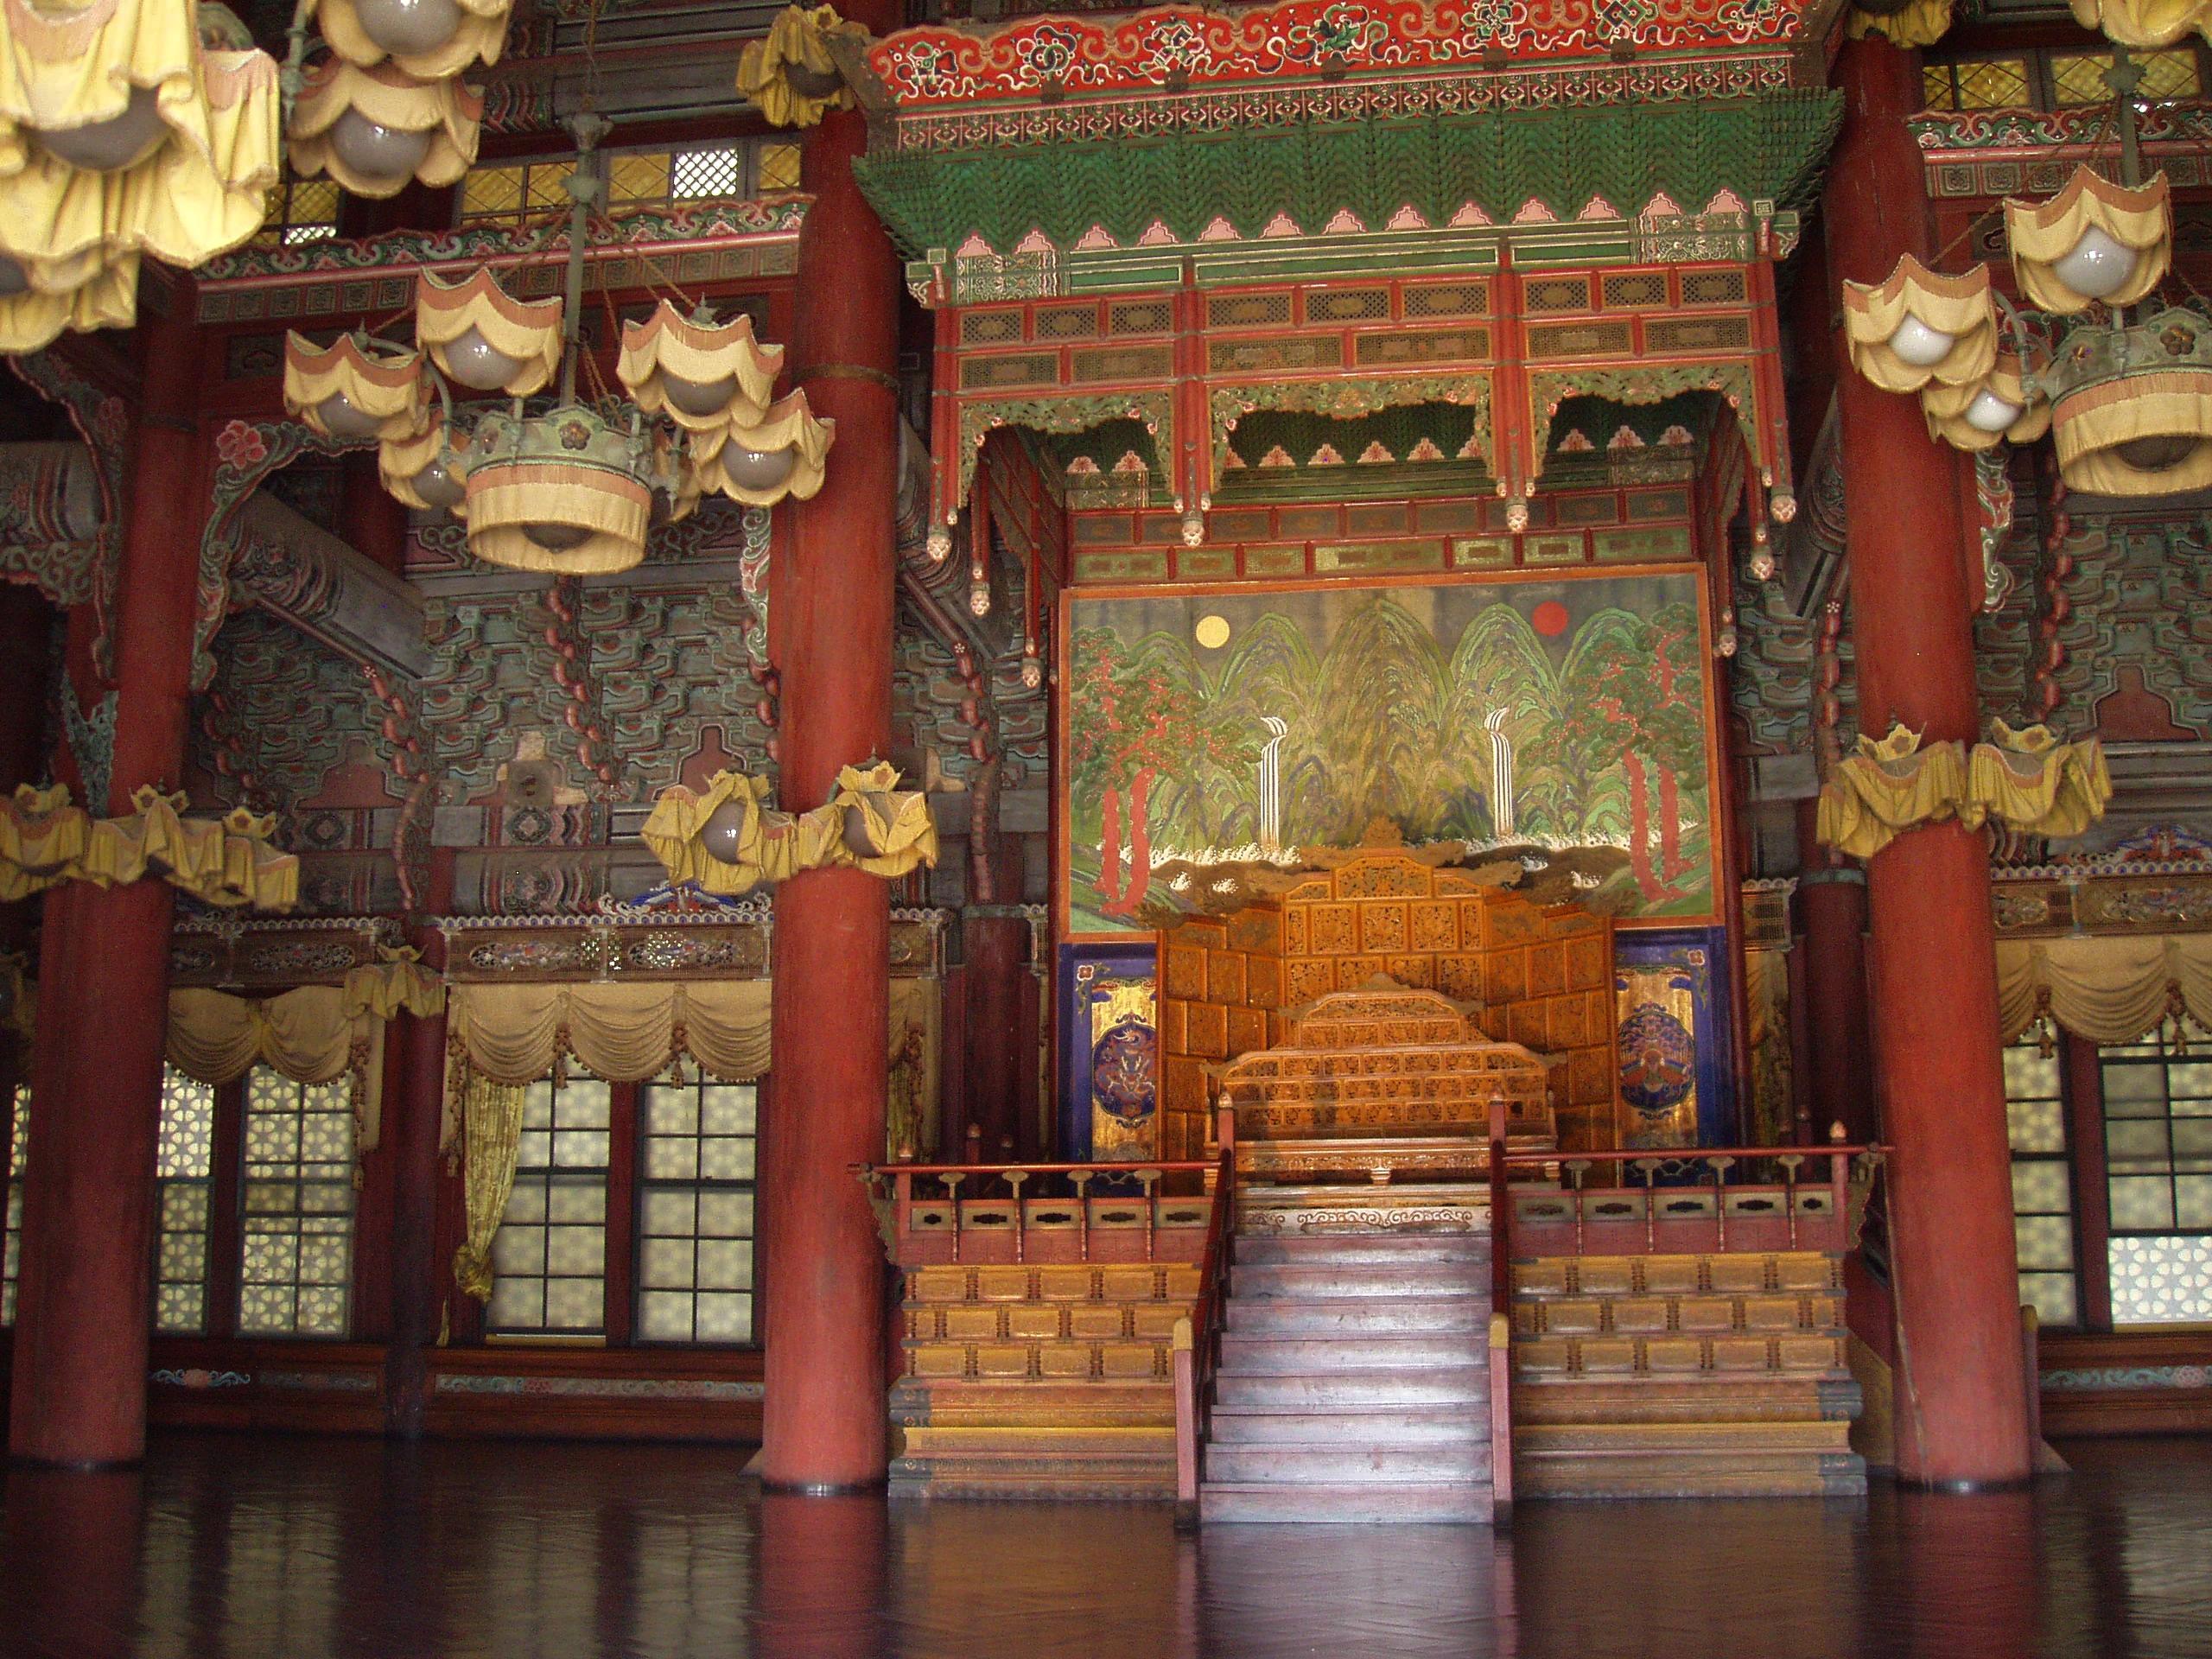 King Palace Chinese Restaurant Limerick